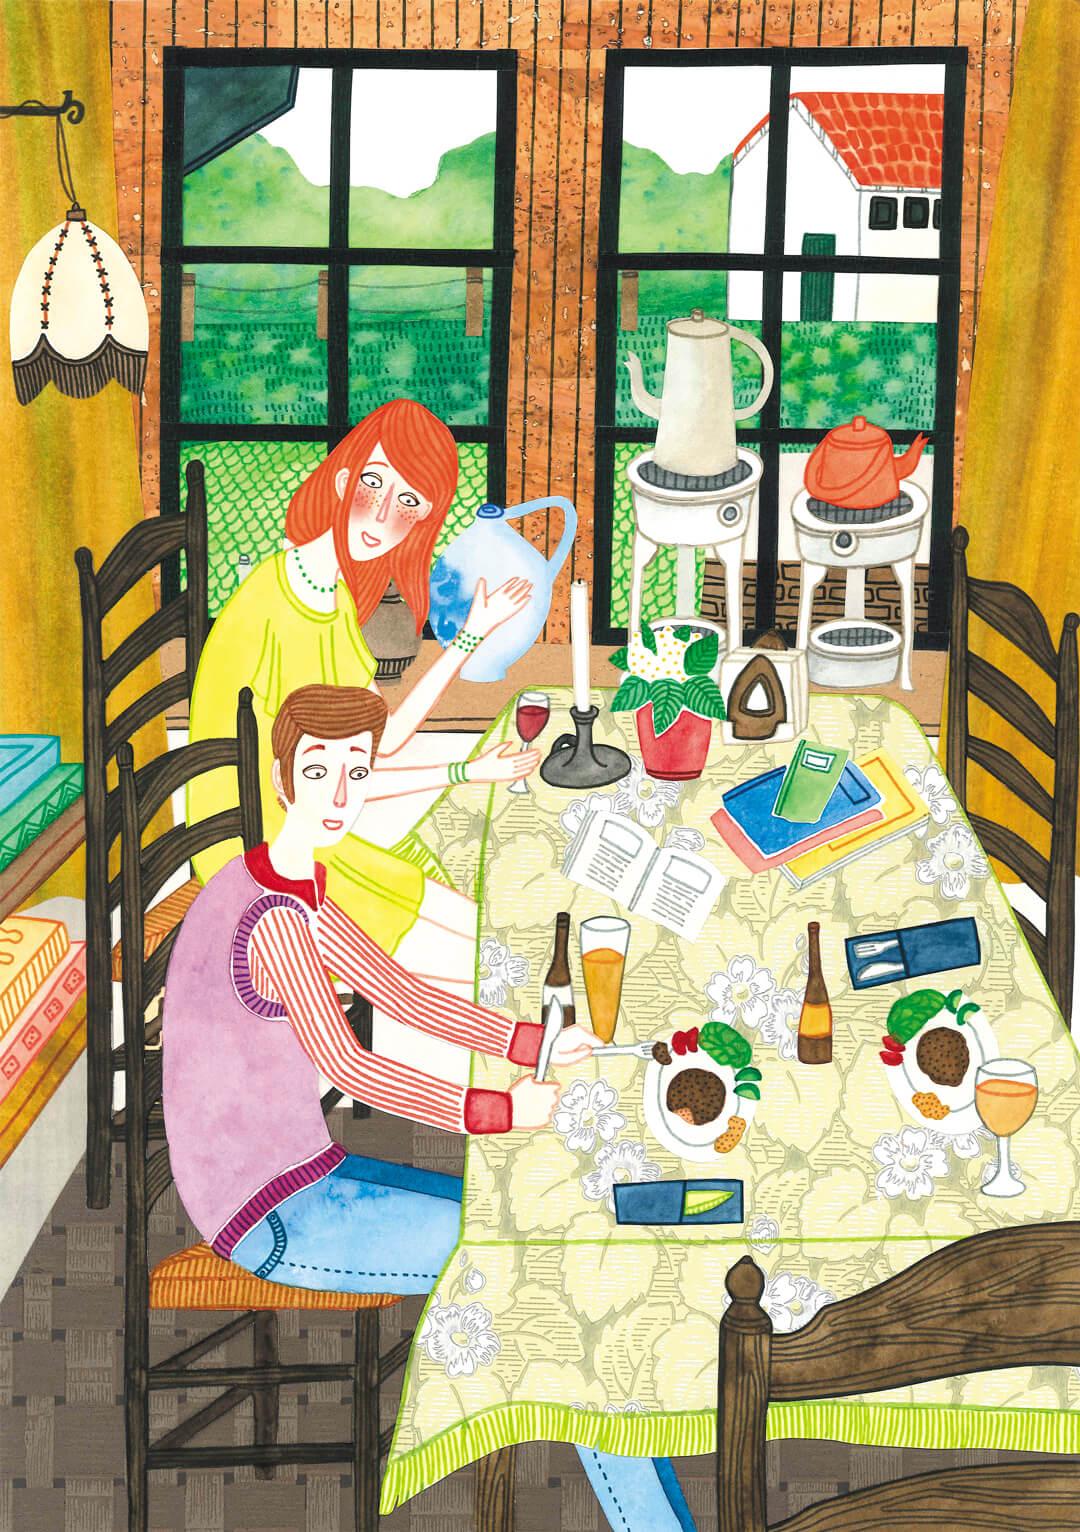 Sanne Bruinsma Illustraties & Vormgeving cultureel cafe De Amer Amen muziek blues country gehaktbal bier bruincafe